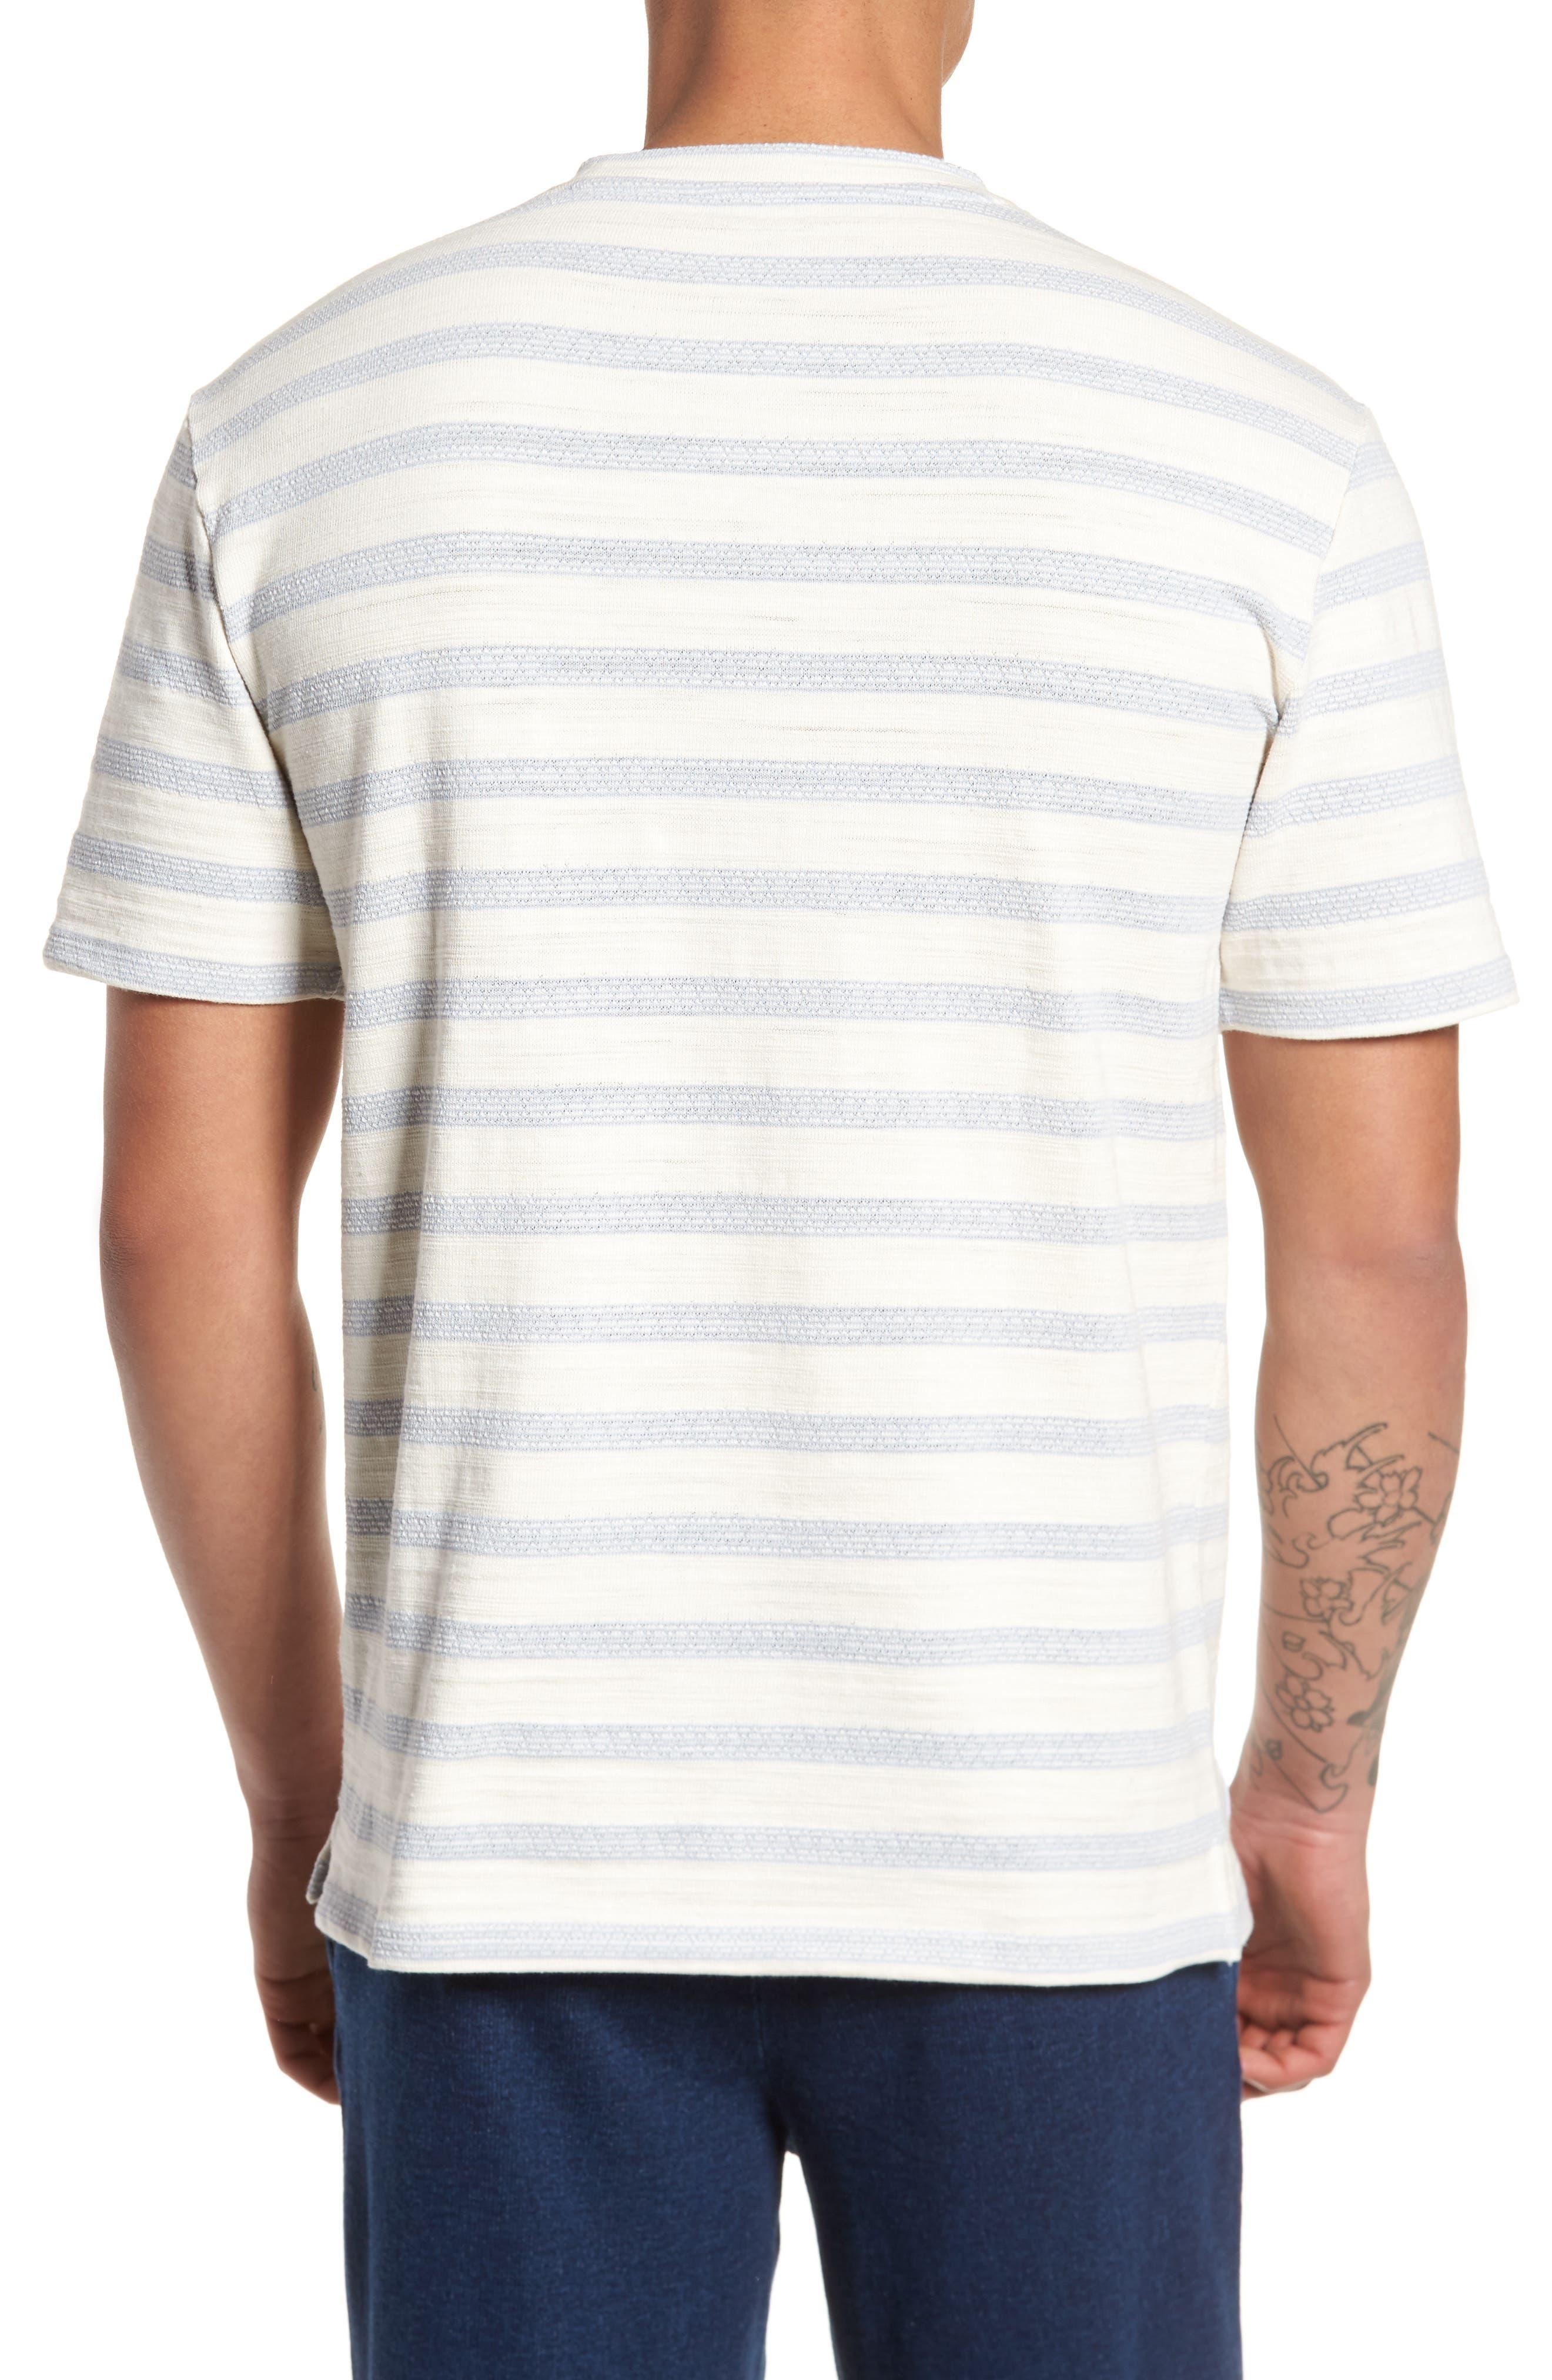 Waves T-Shirt,                             Alternate thumbnail 2, color,                             Off White